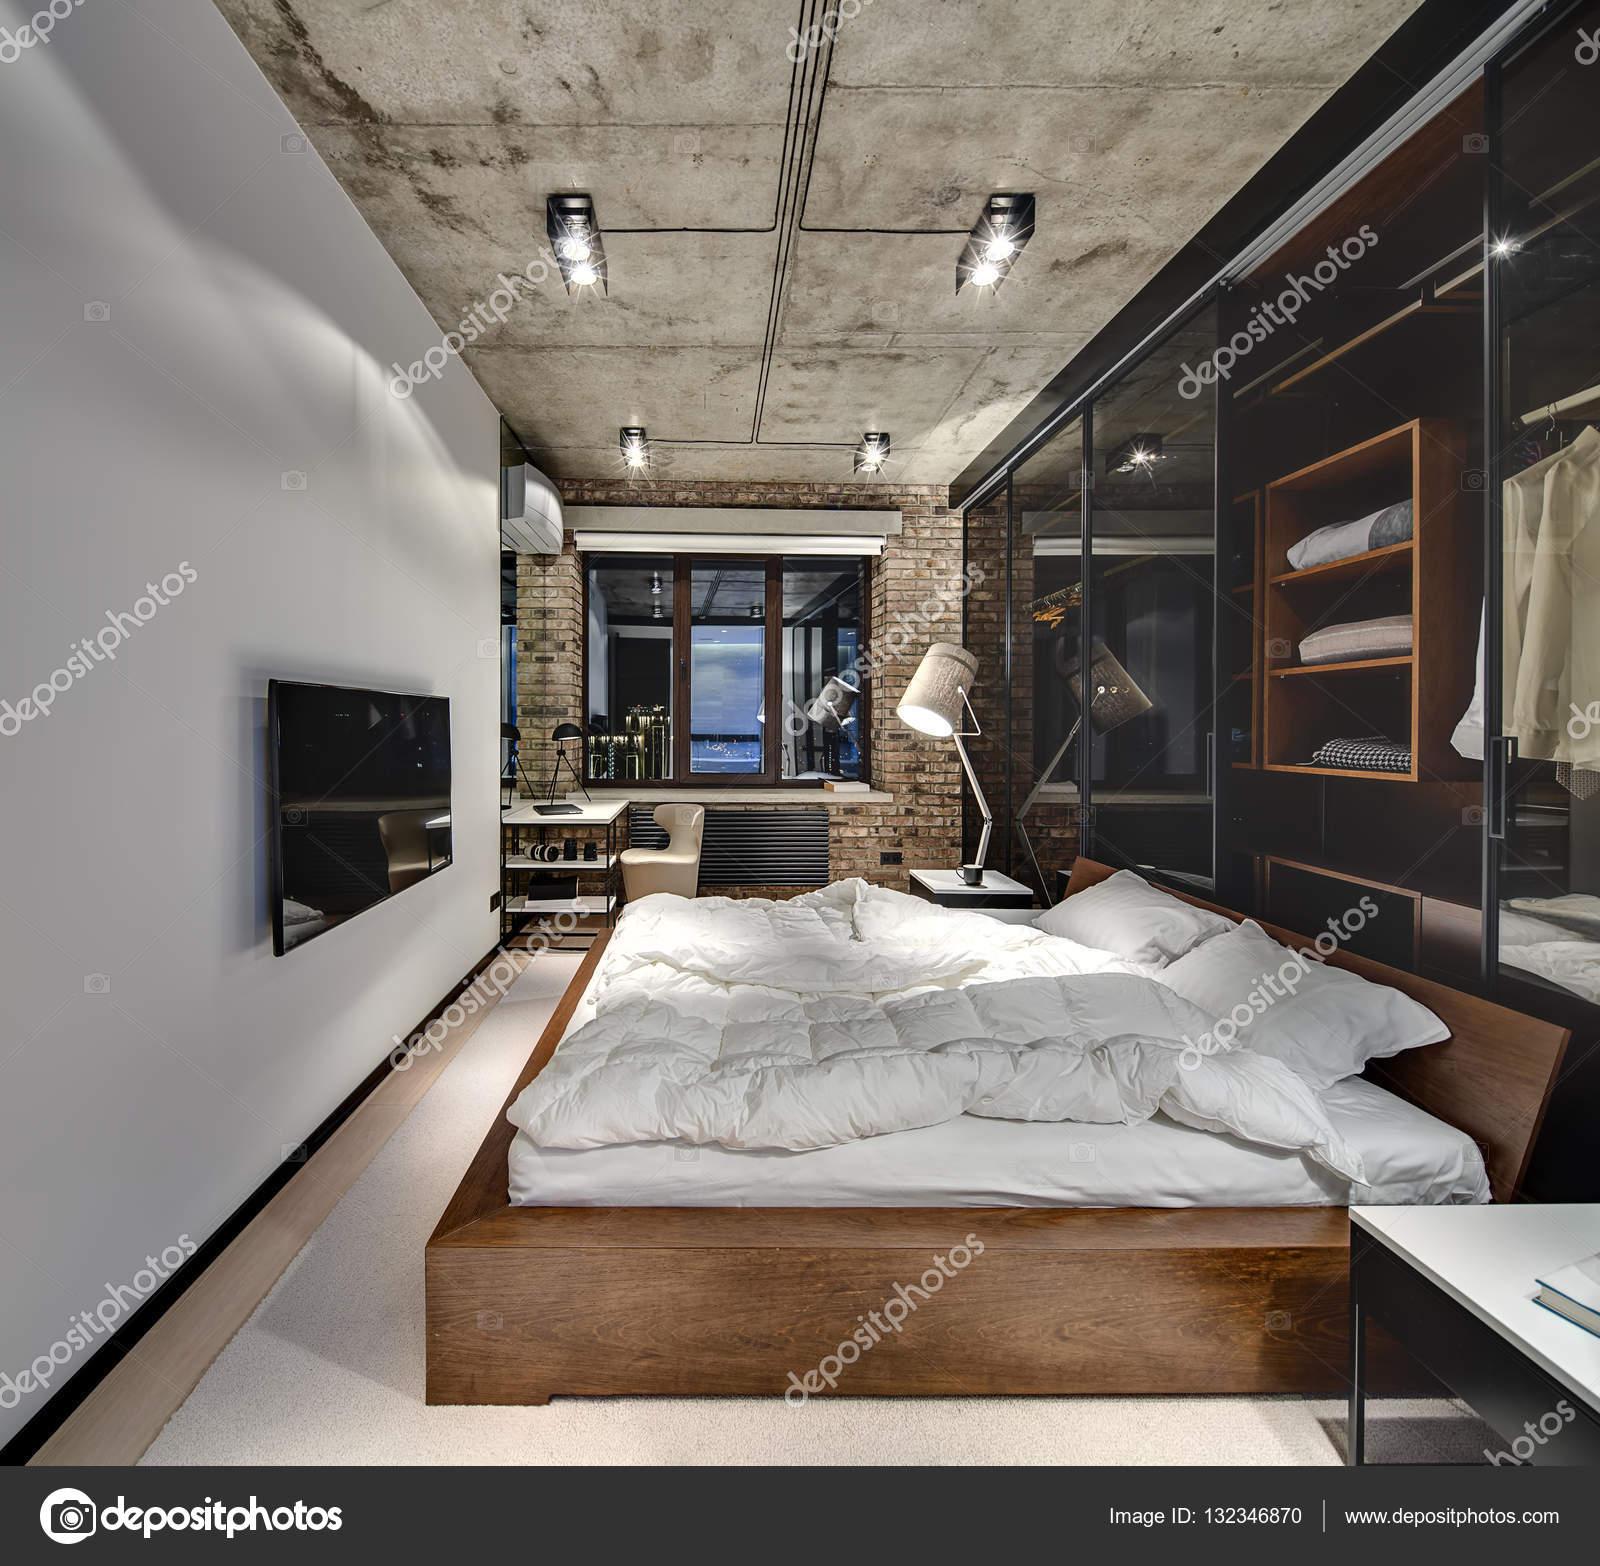 Loft stijl slaapkamer — Stockfoto © bezikus #132346870